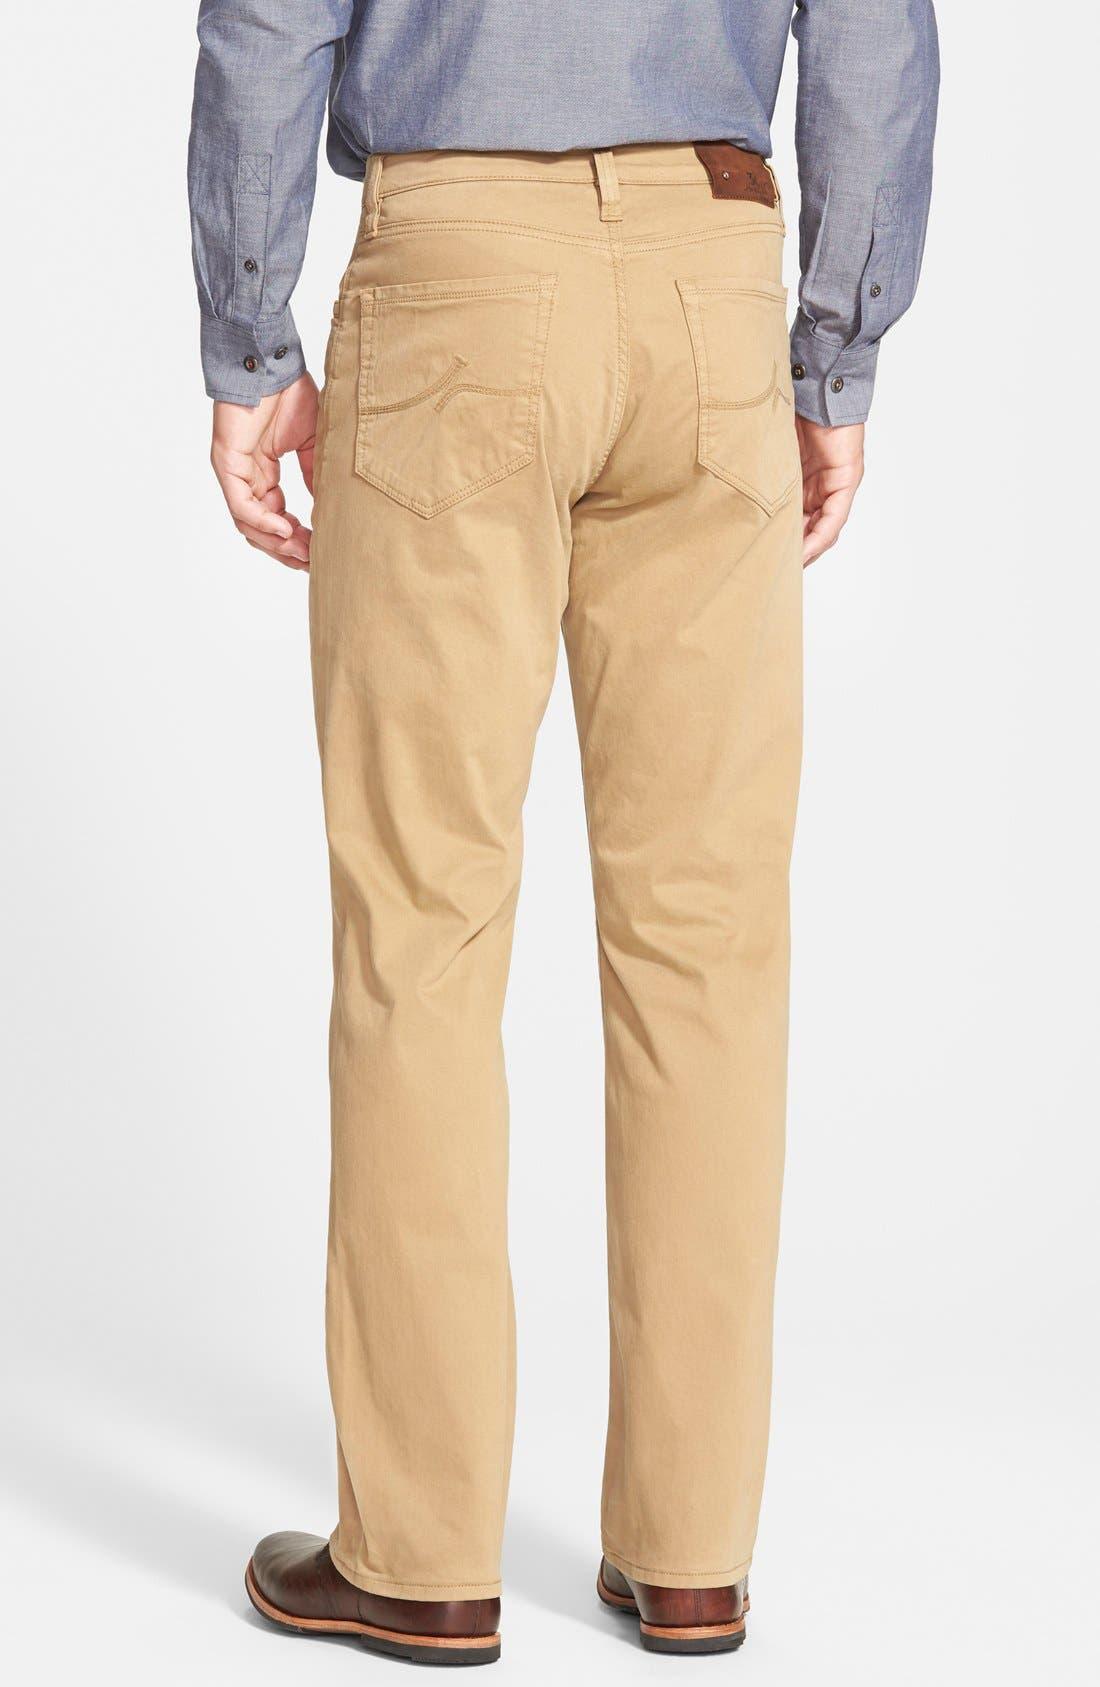 'Charisma' Classic Relaxed Fit Pants,                             Alternate thumbnail 2, color,                             BEIGE/ KHAKI